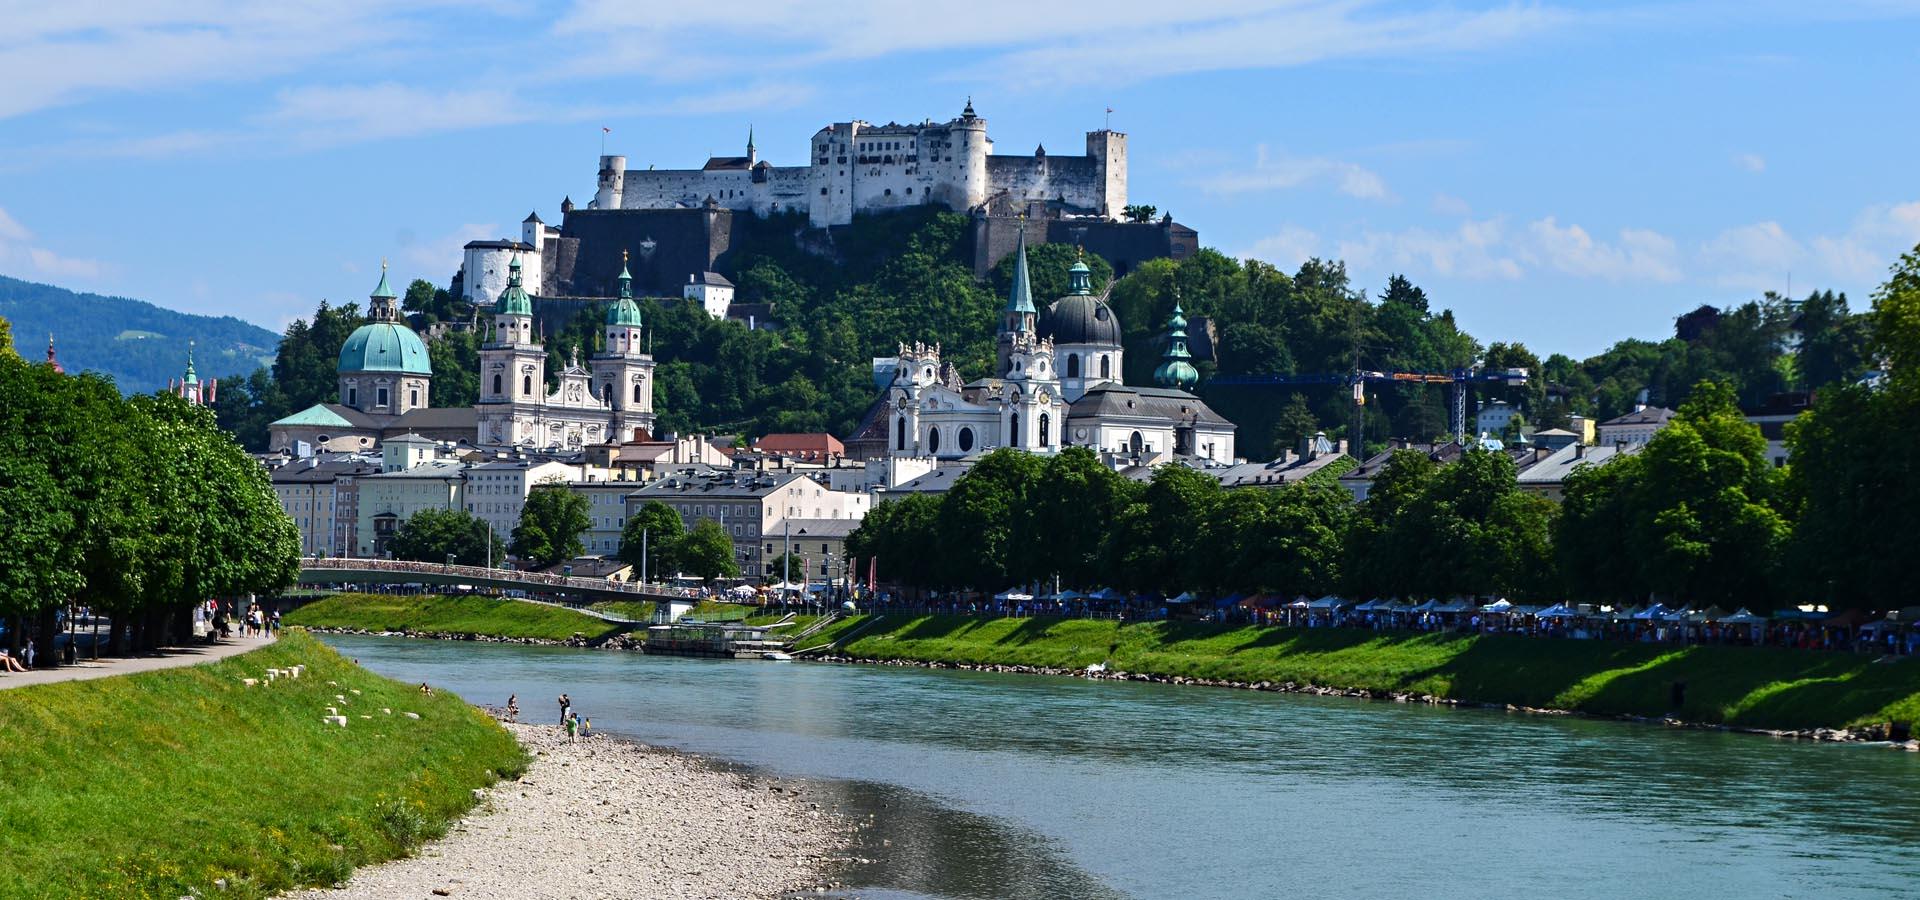 Austria's Great Cities